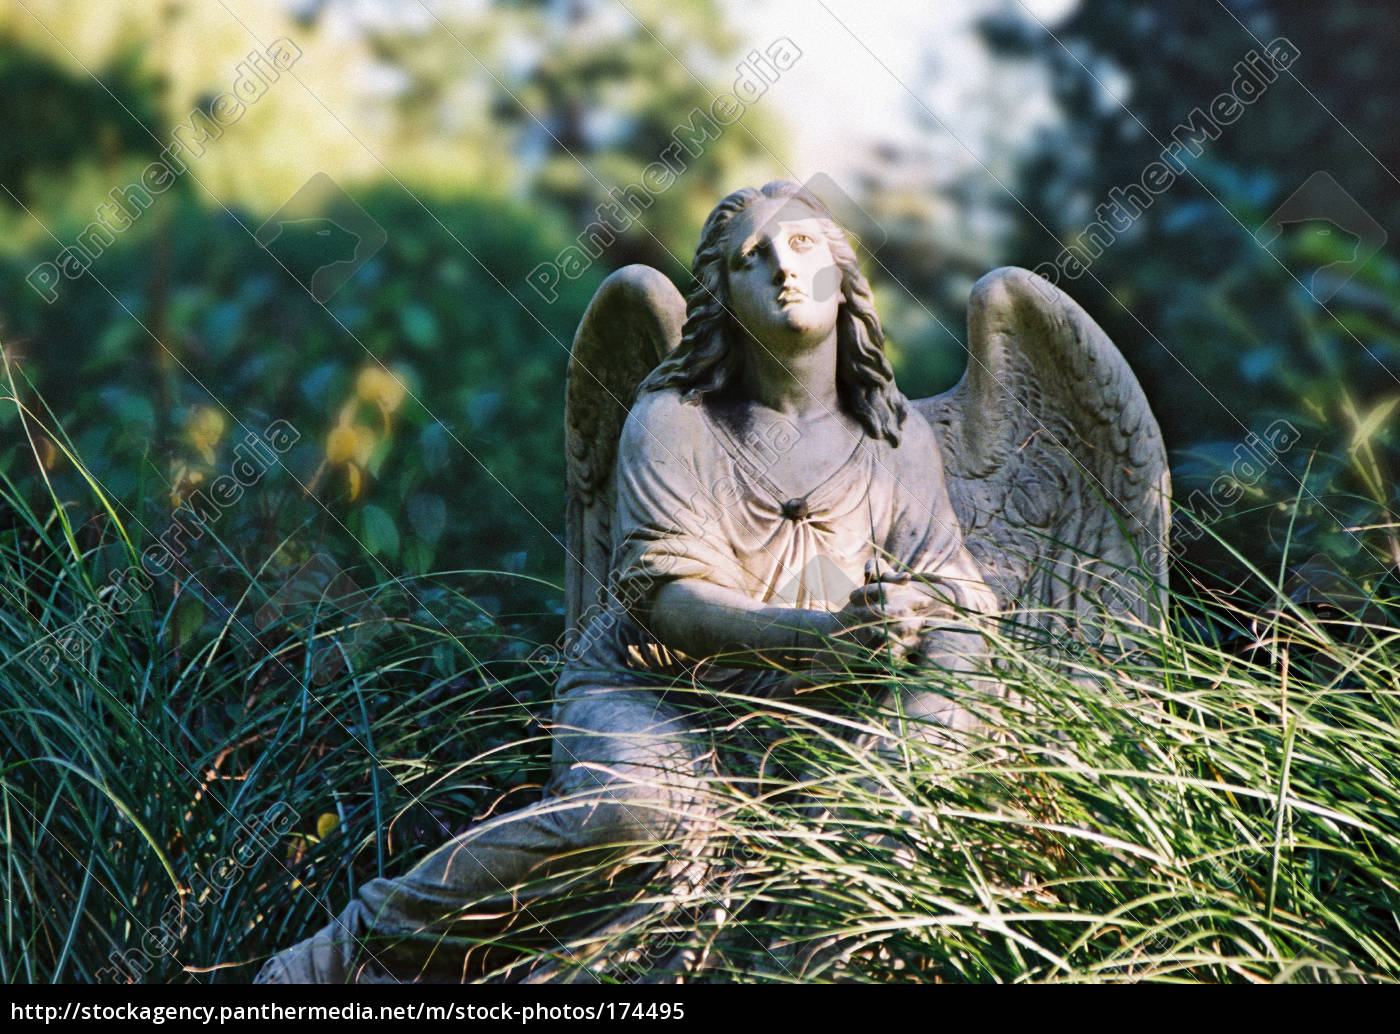 angel - 174495